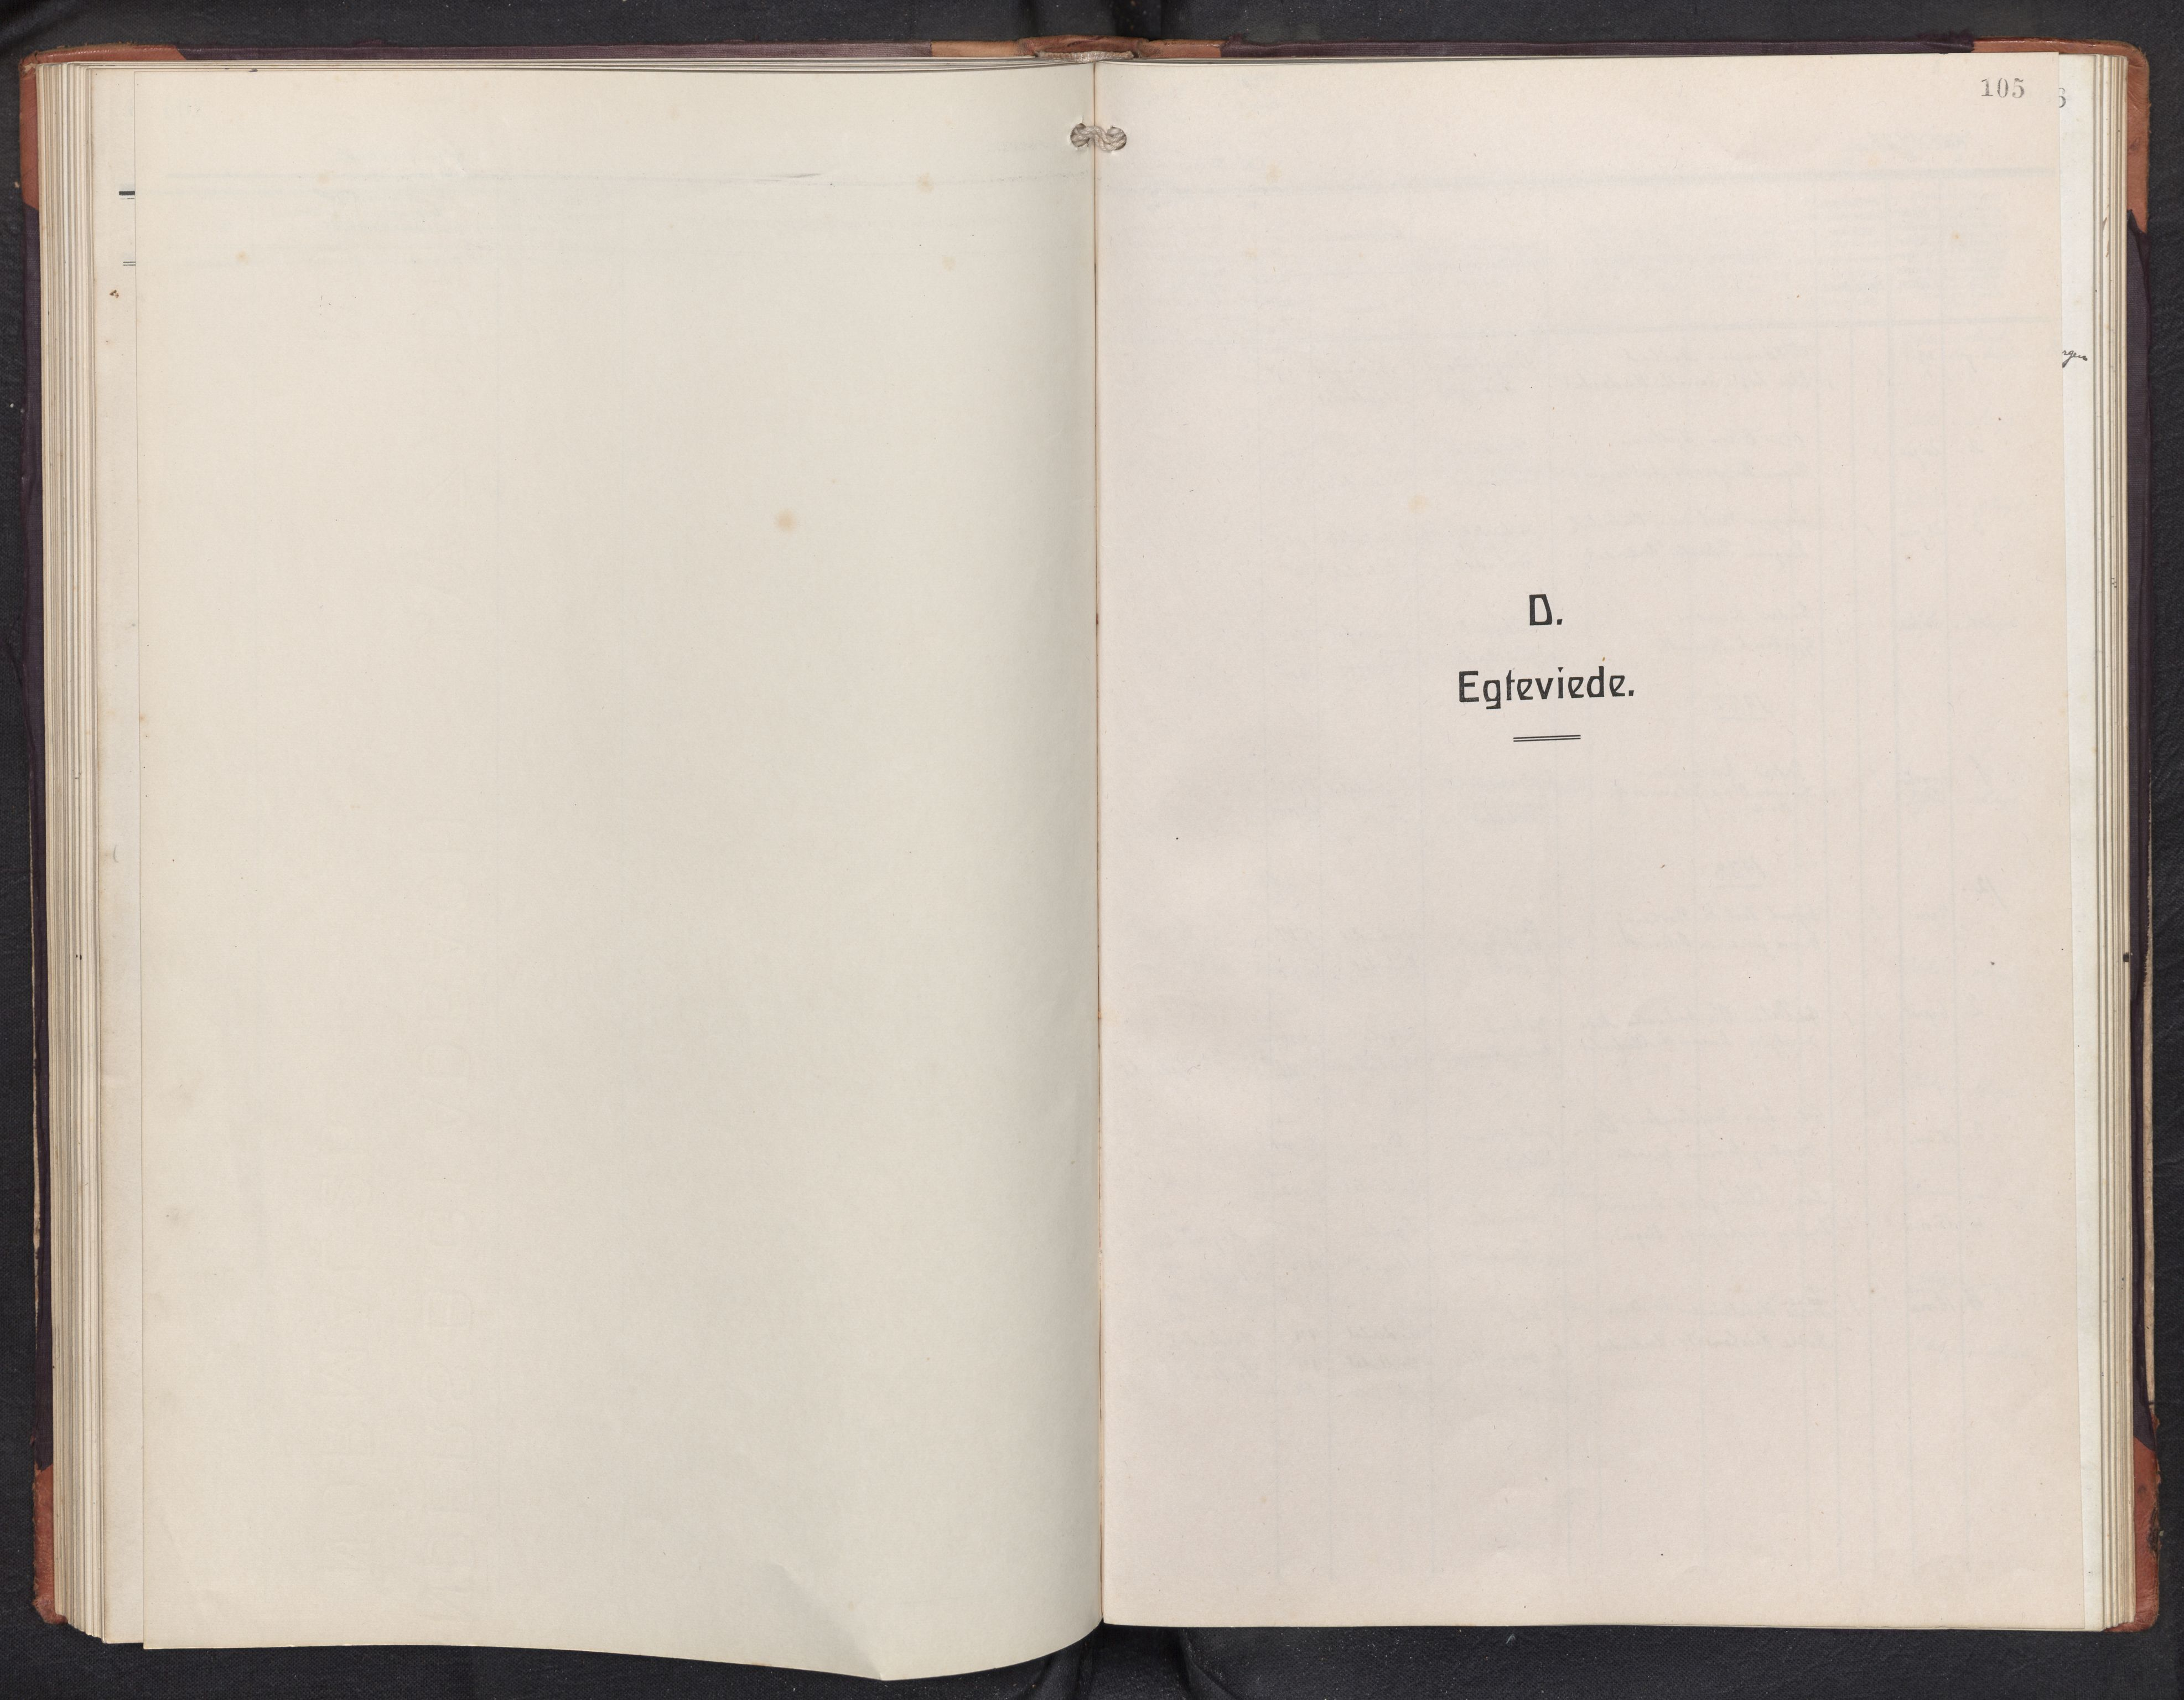 SAB, Aurland sokneprestembete, H/Hb/Hbd/L0003: Klokkerbok nr. D 3, 1920-1968, s. 104b-105a